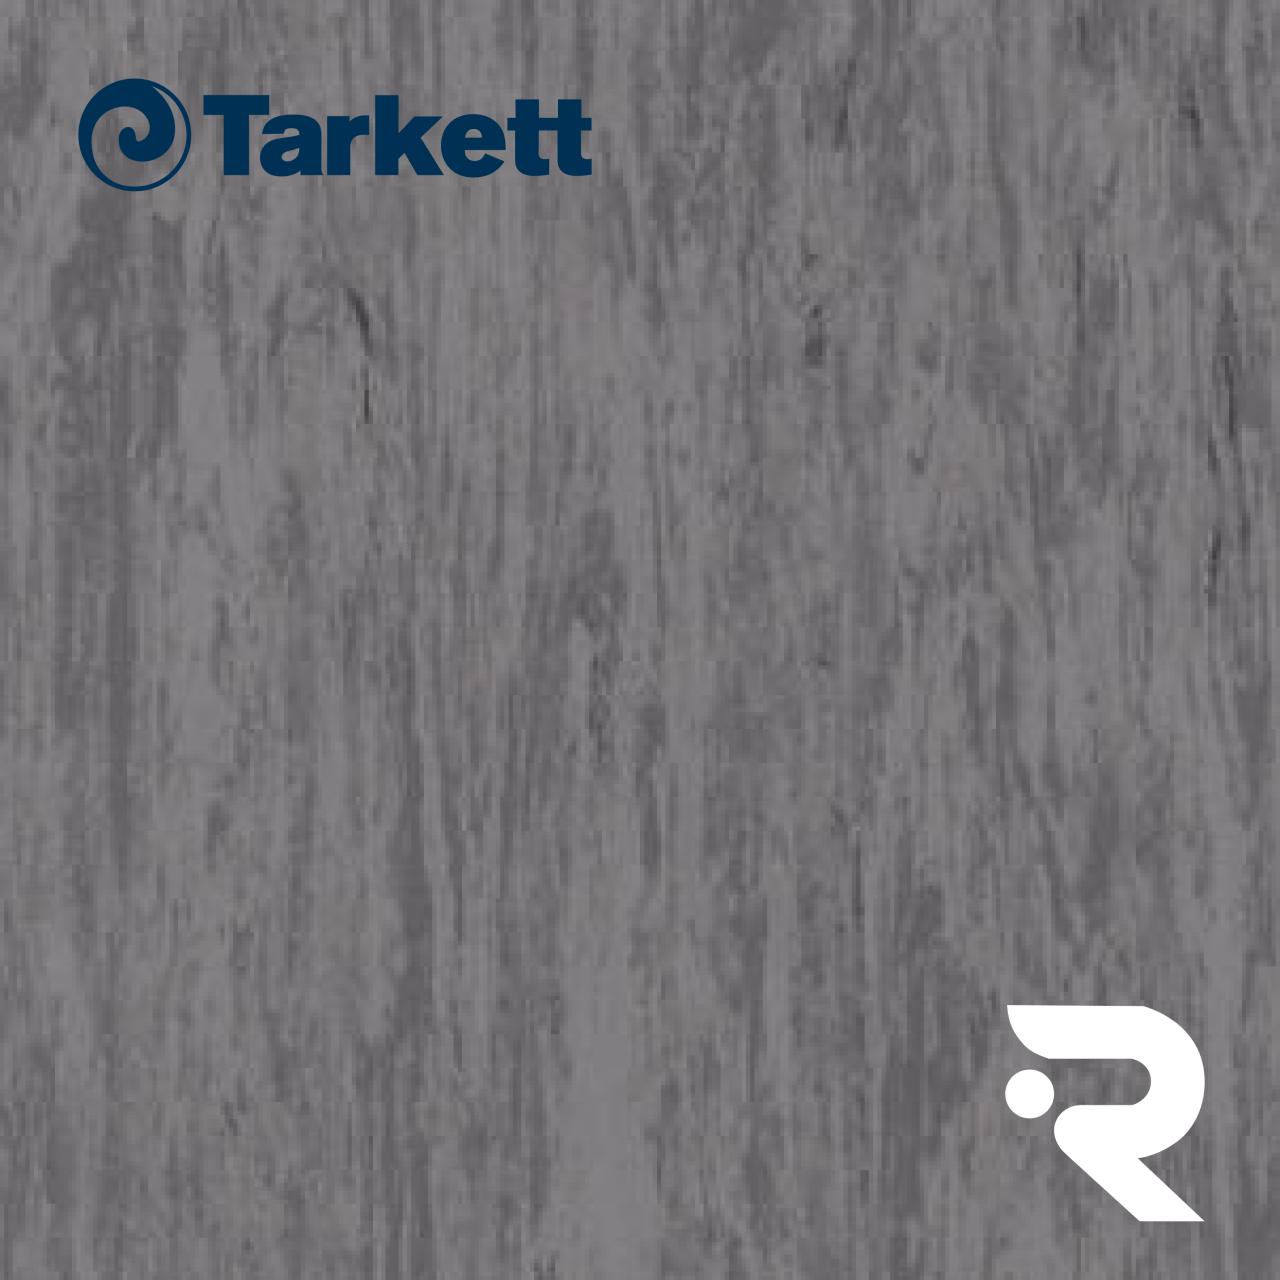 🏫 Гомогенный линолеум Tarkett   Standard DARK STONE GREY 0499   Standard Plus 2.0 mm   2 х 23 м